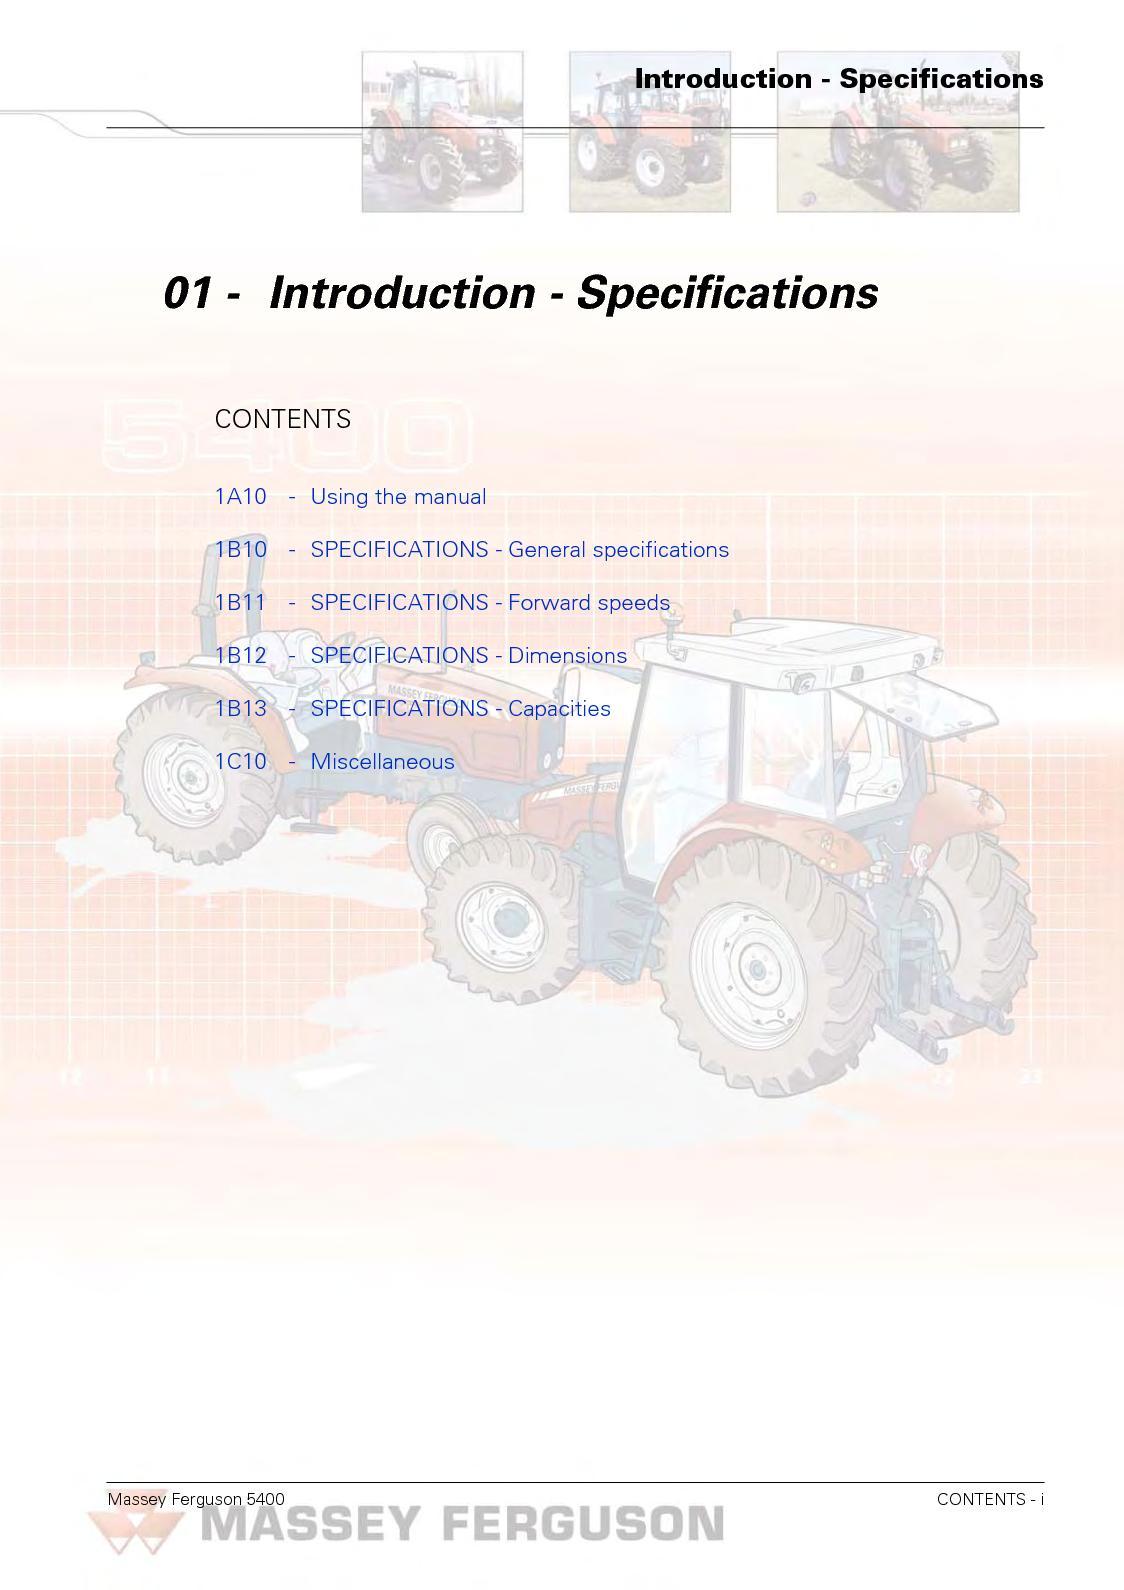 Massey Ferguson 5445 Wiring Diagram Modern Design Of To 30 Calam O Mf Tractor Service Repair Manual Rh Calameo Com